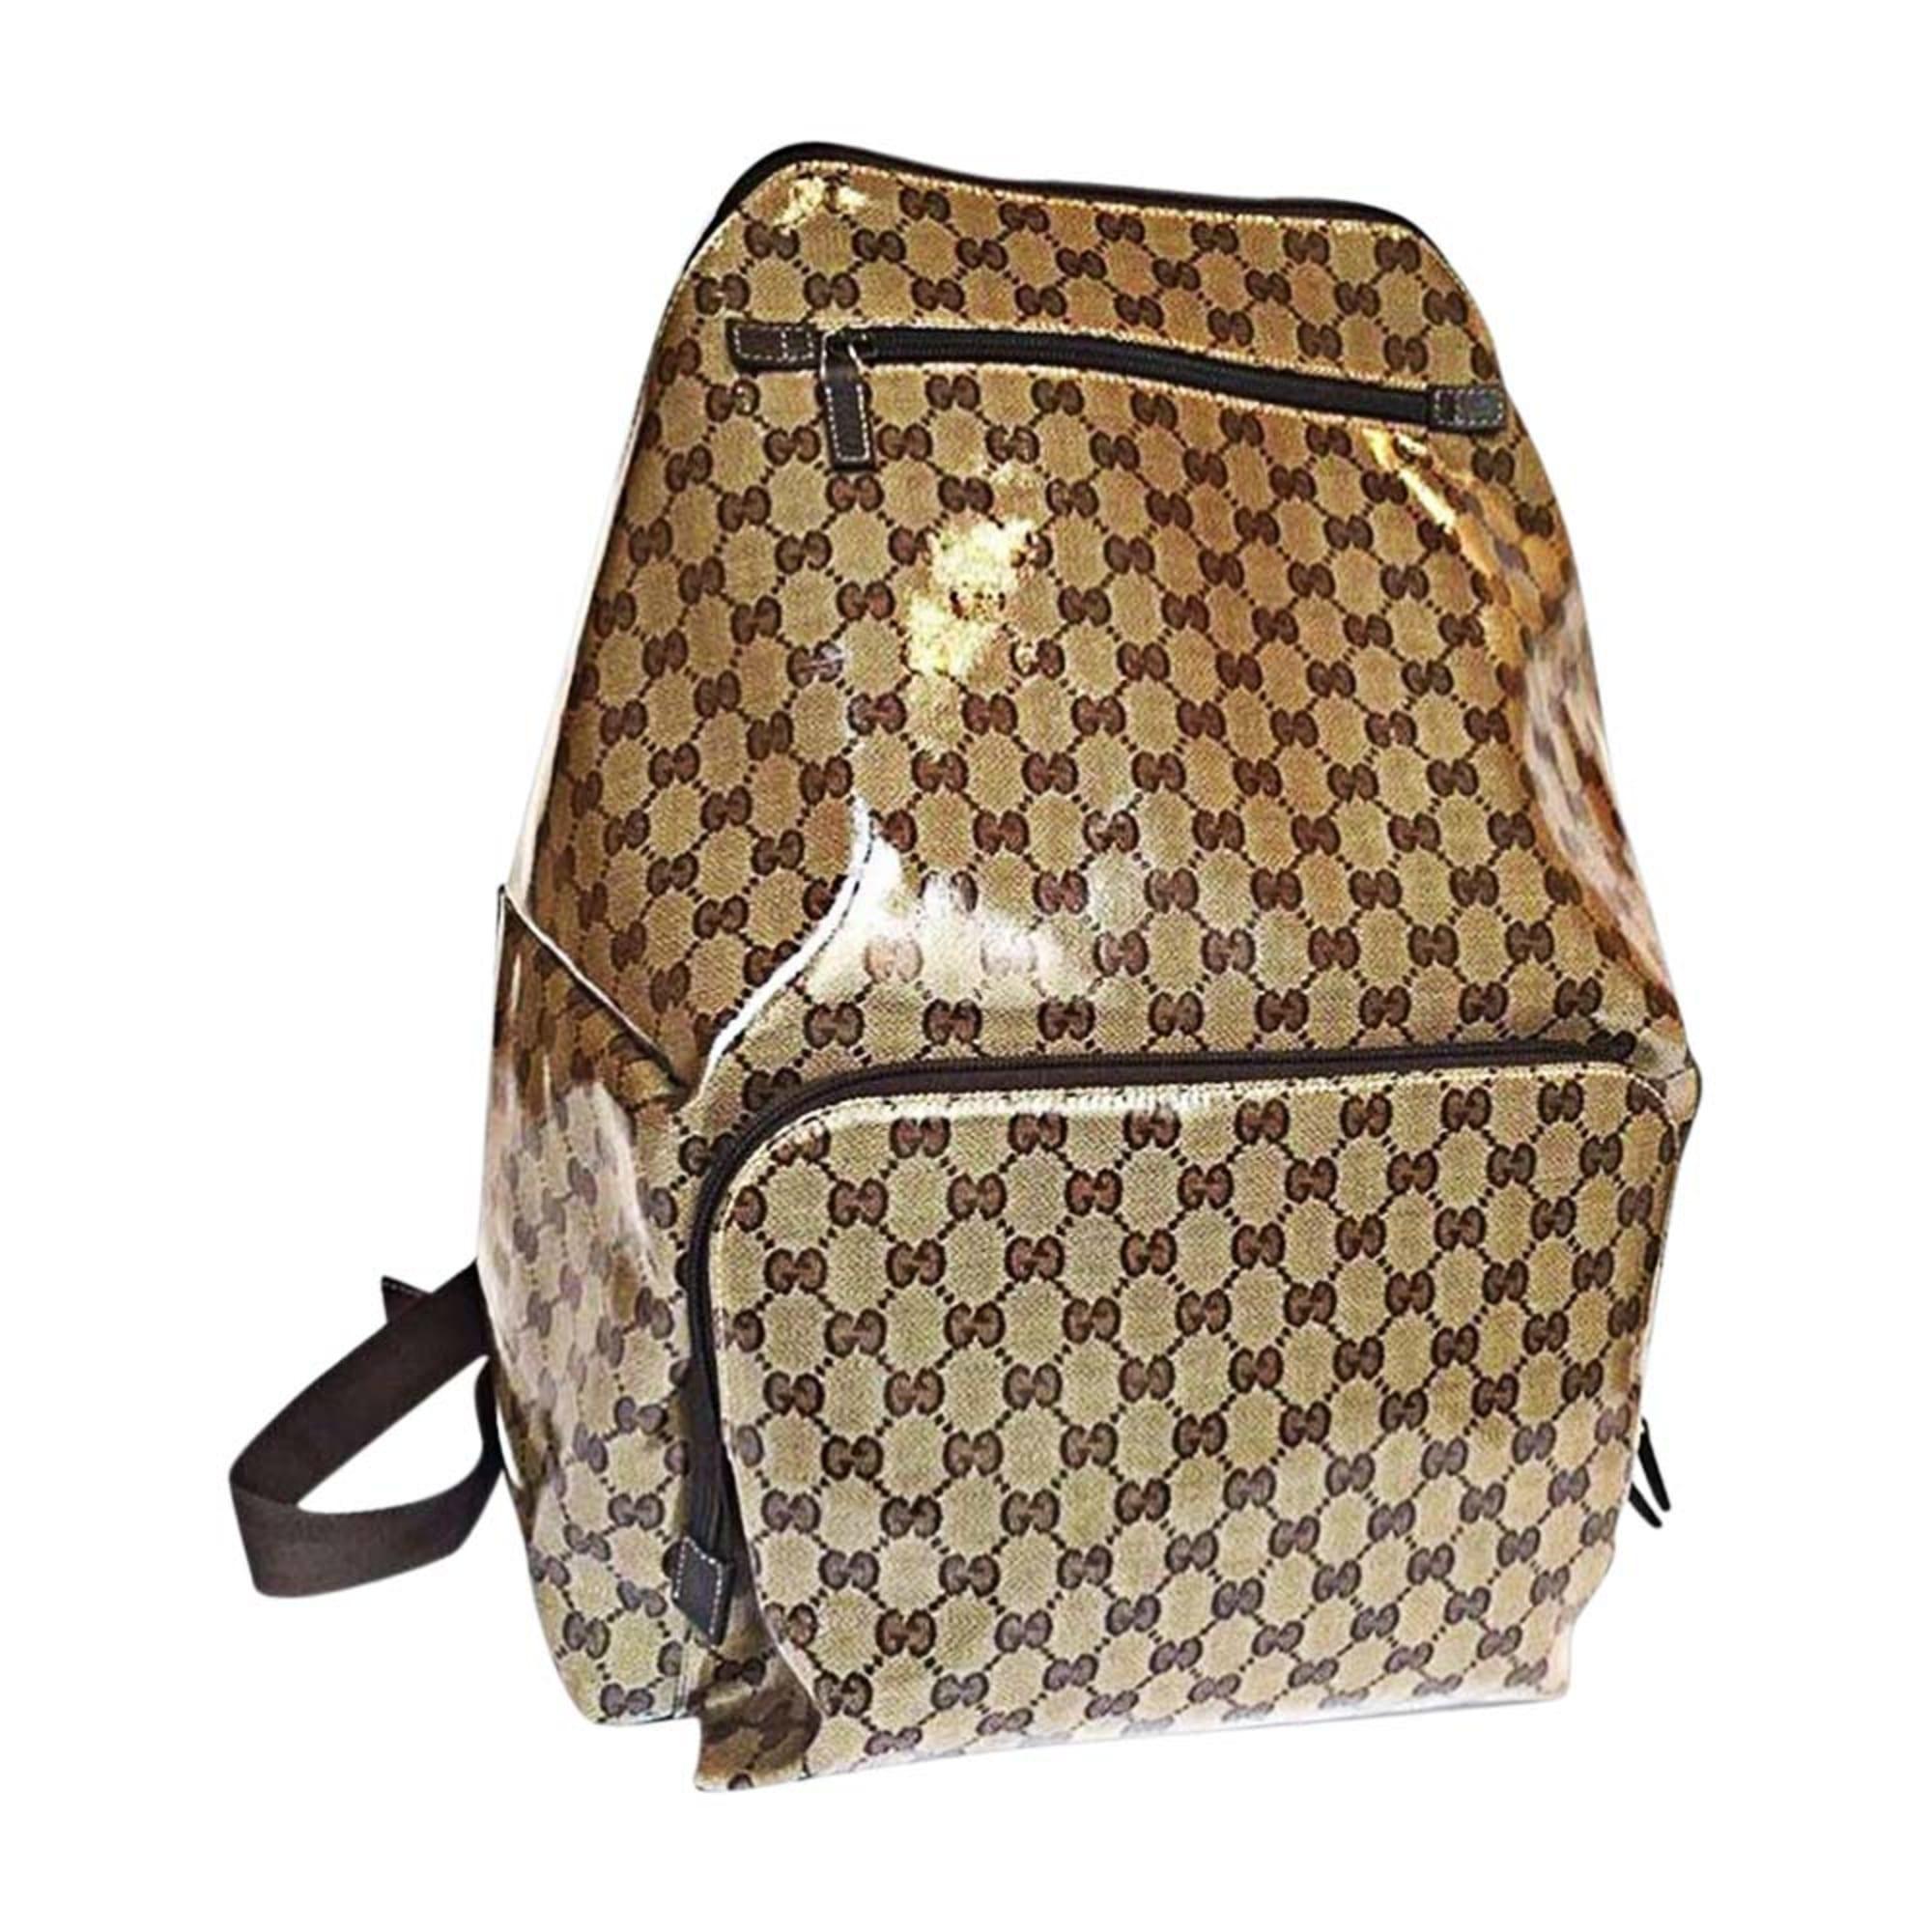 dd416c8a2829 Backpack GUCCI brown vendu par Vide dressing de sarah - 7106100